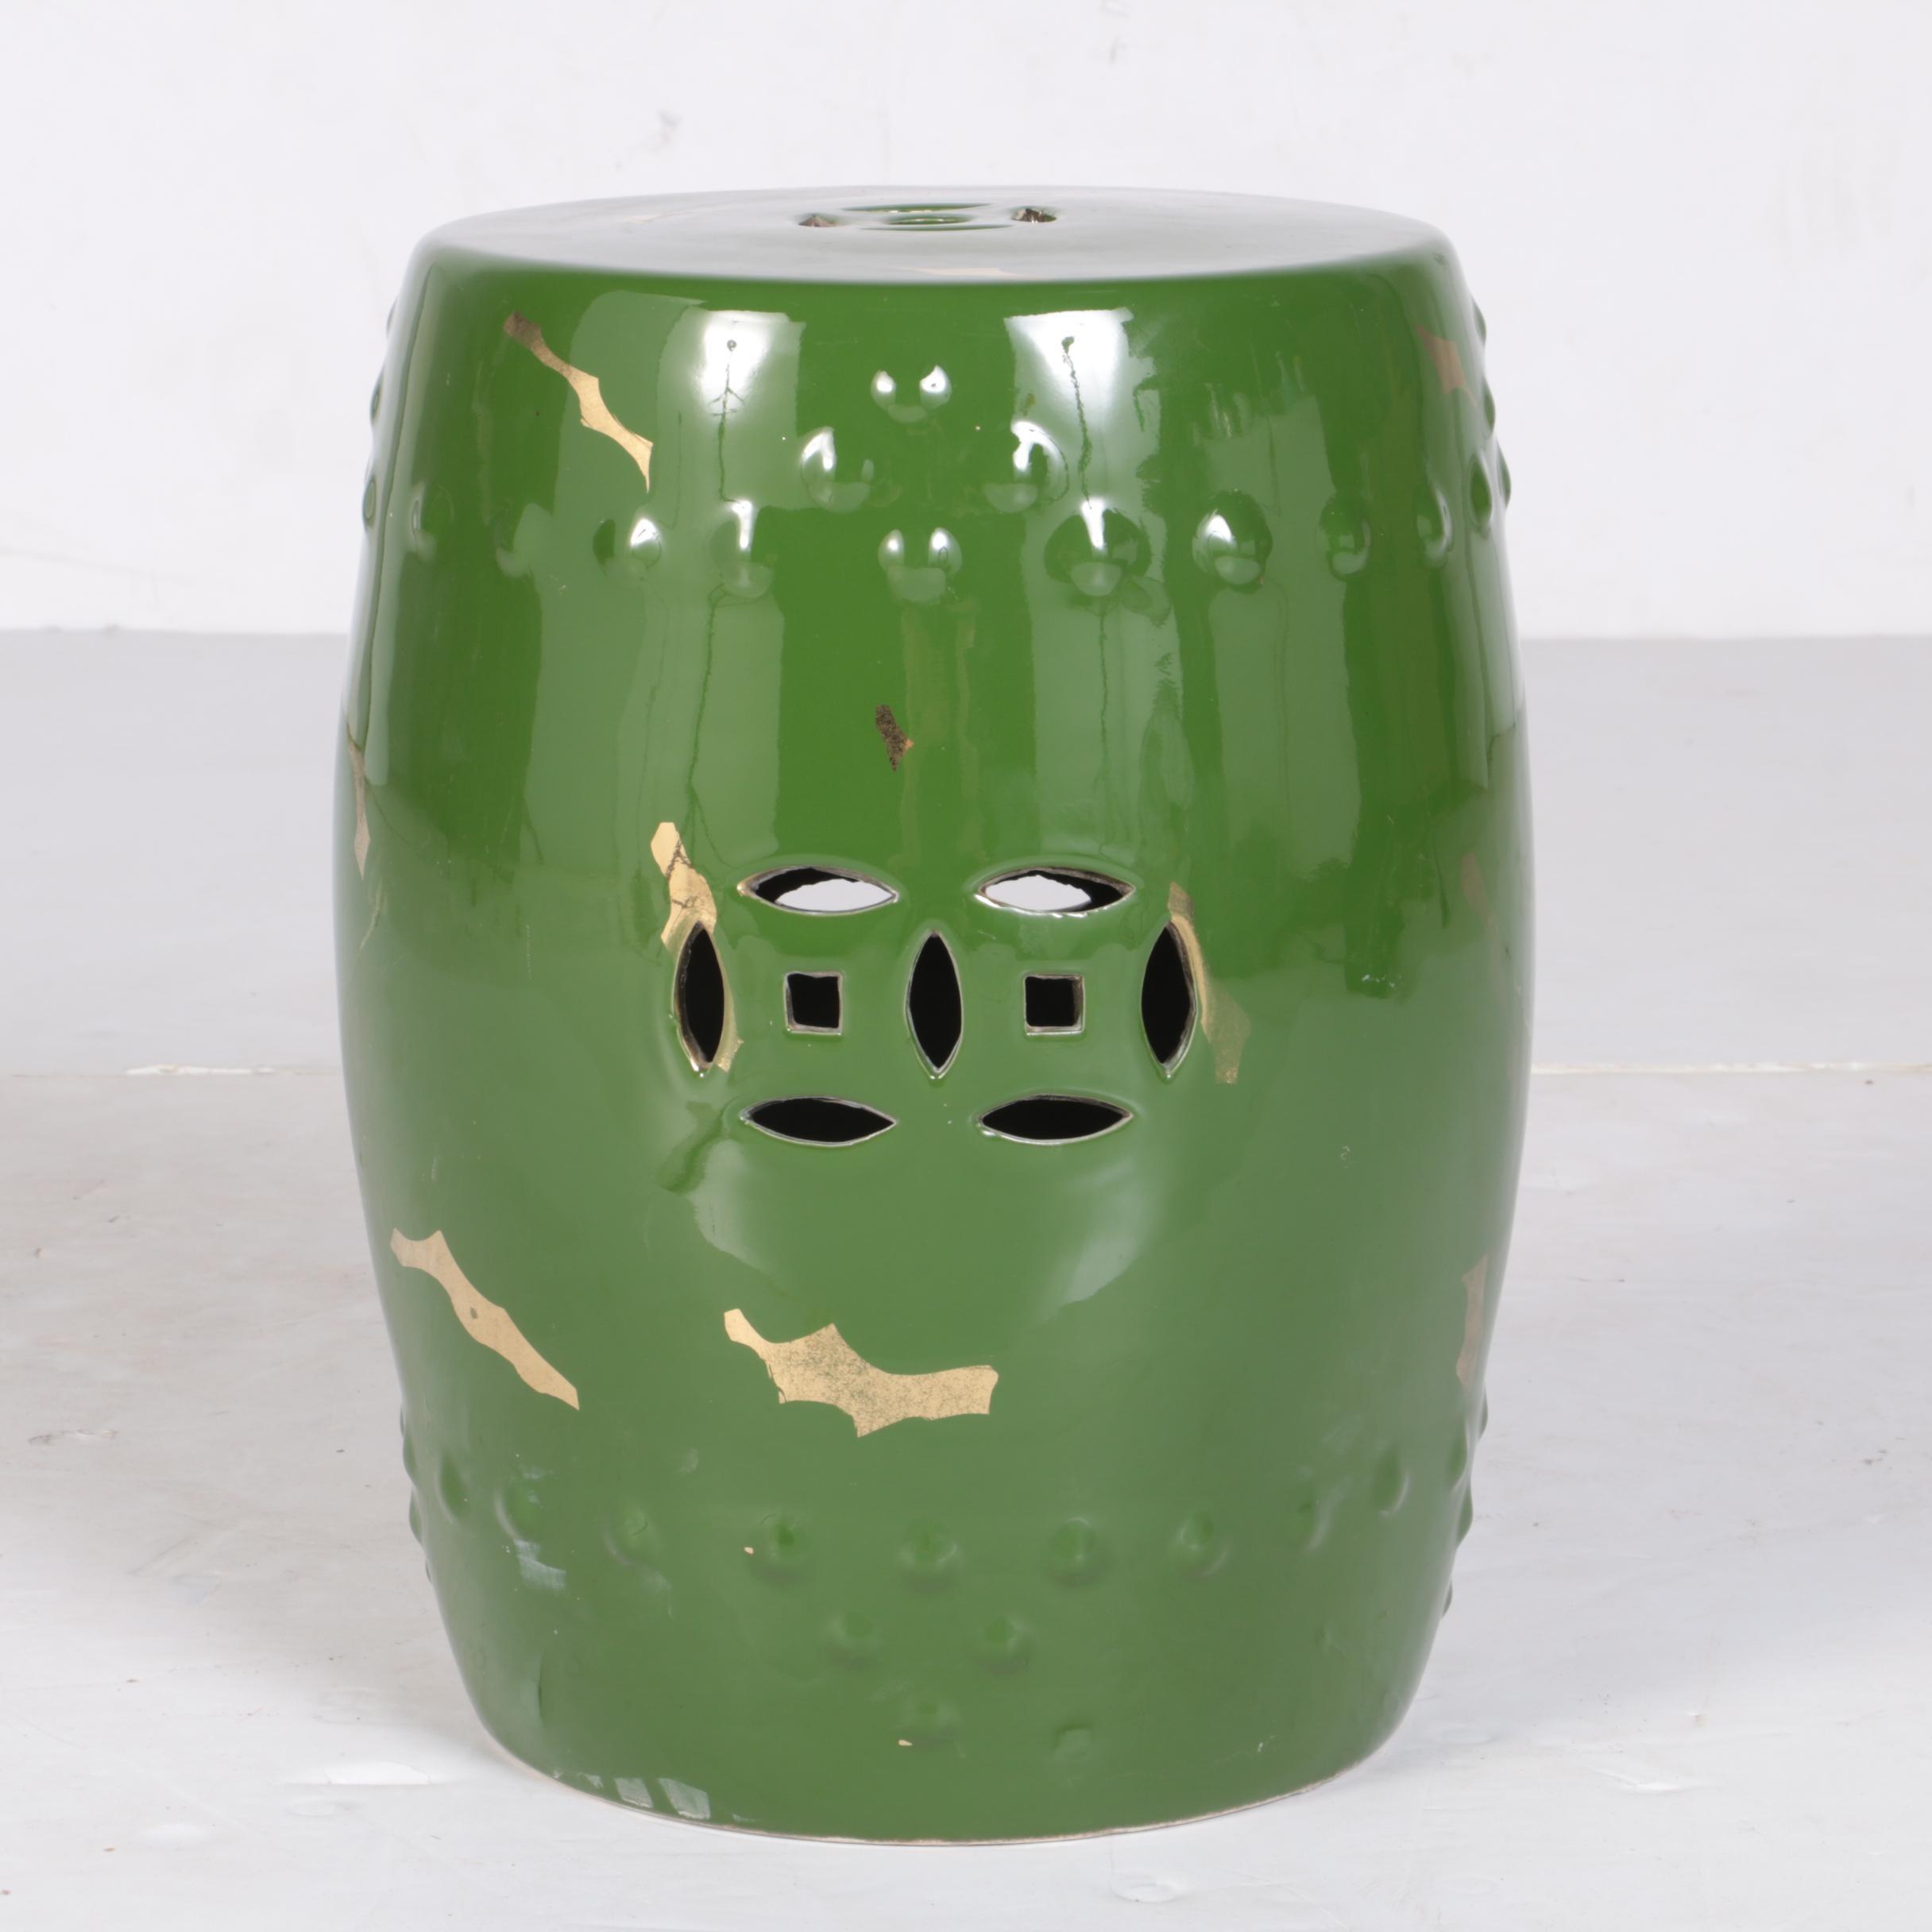 Chinese Green Painted Ceramic Garden Stool